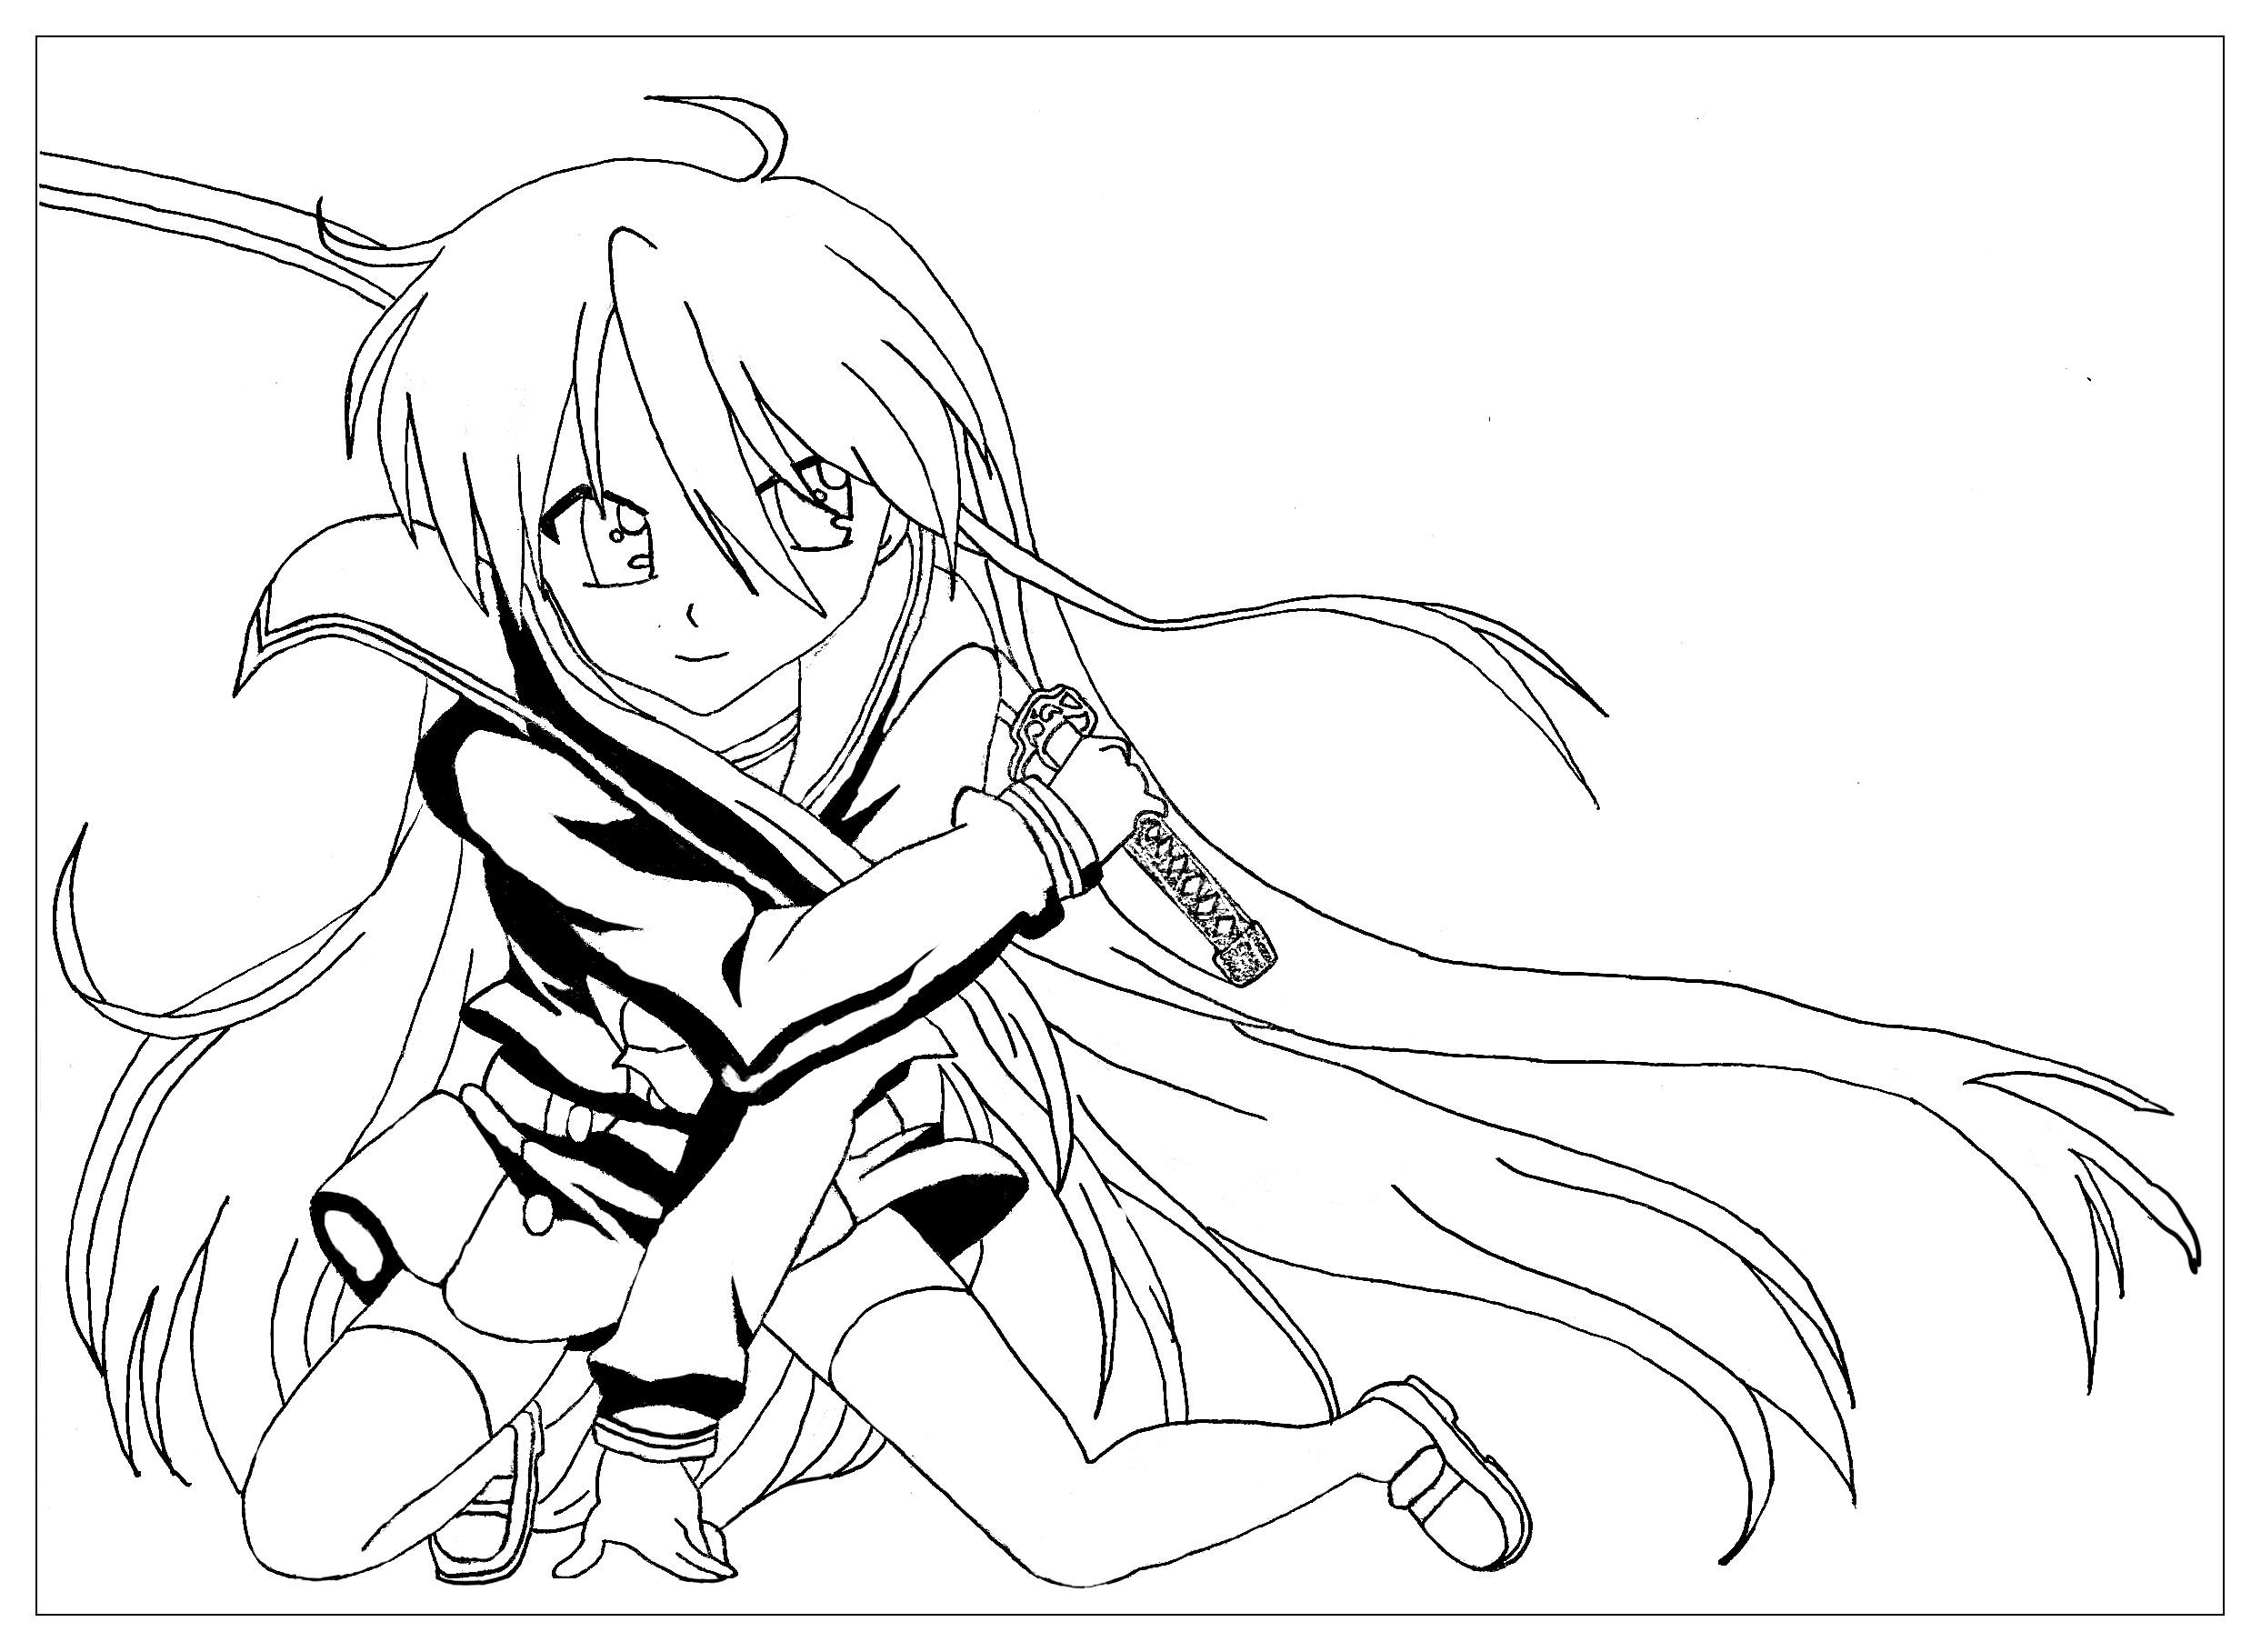 Manga Saber Warrior Girl Manga Anime Adult Coloring Pages